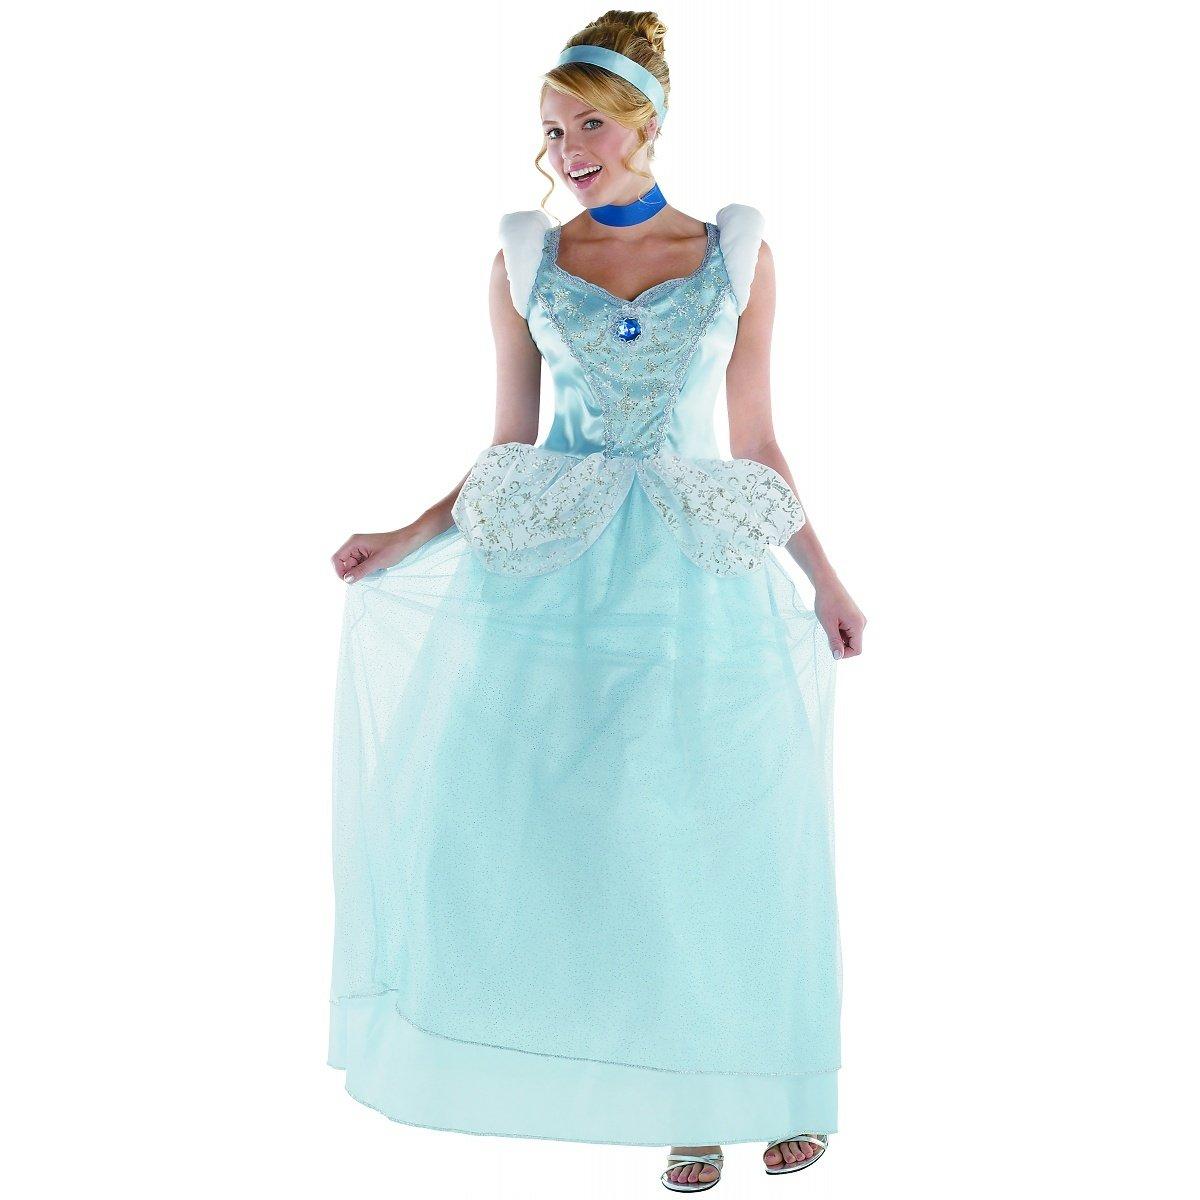 Amazon.com: Disguise Women\'s Disney Cinderella Deluxe Costume: Clothing